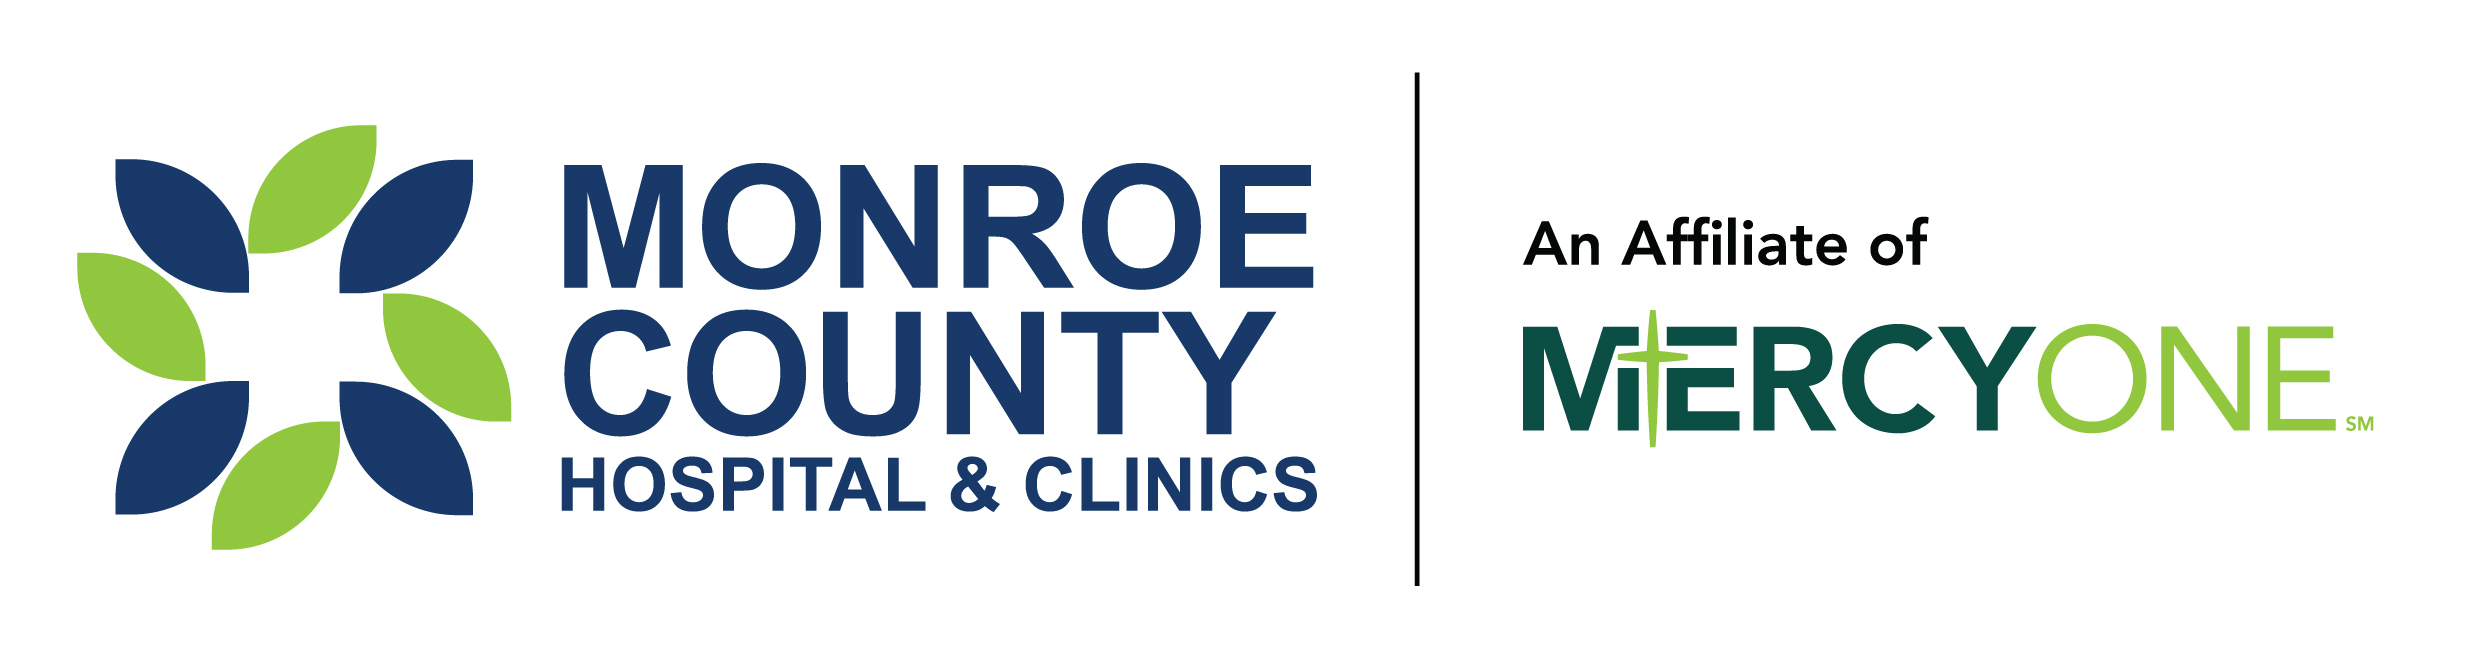 Monroe County Hospital & Clinics logo